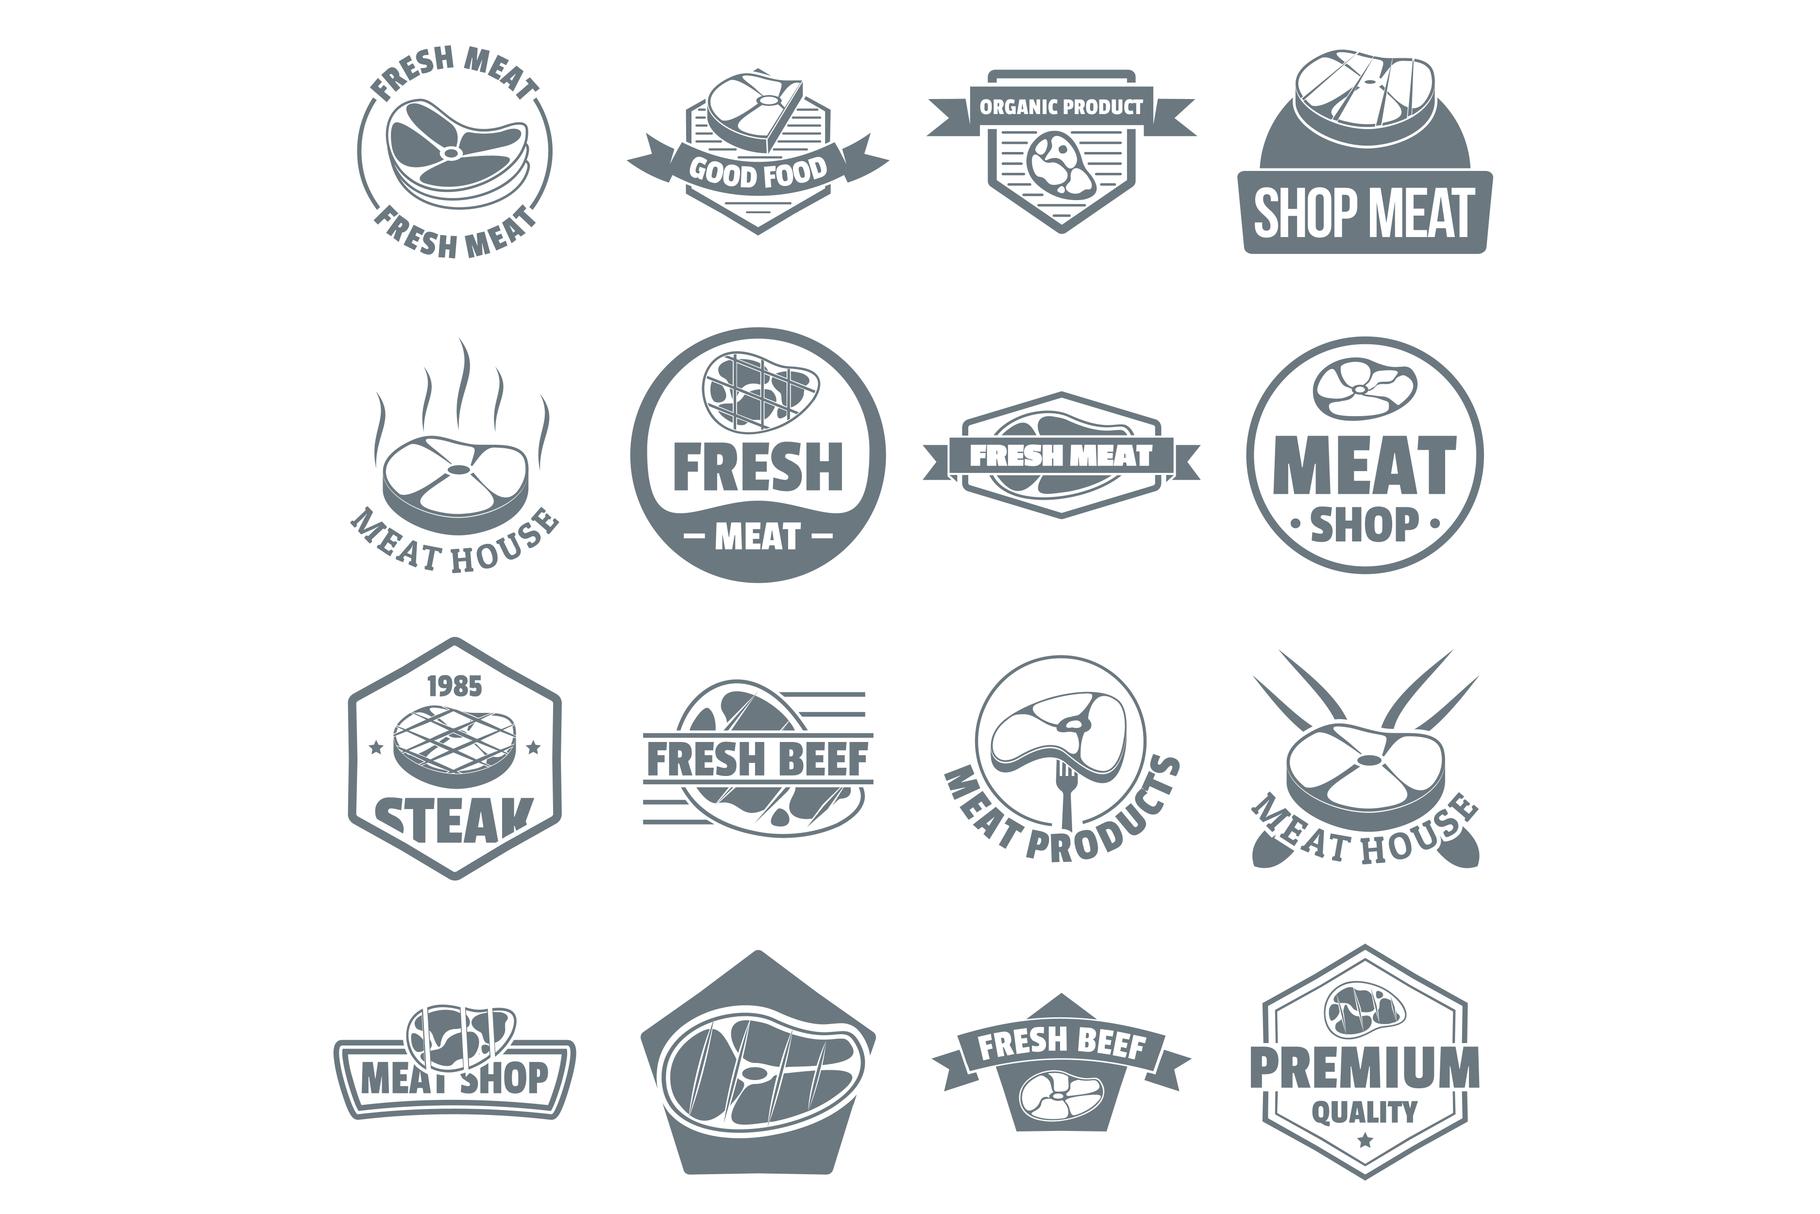 Steak logo icons set, simple style example image 1